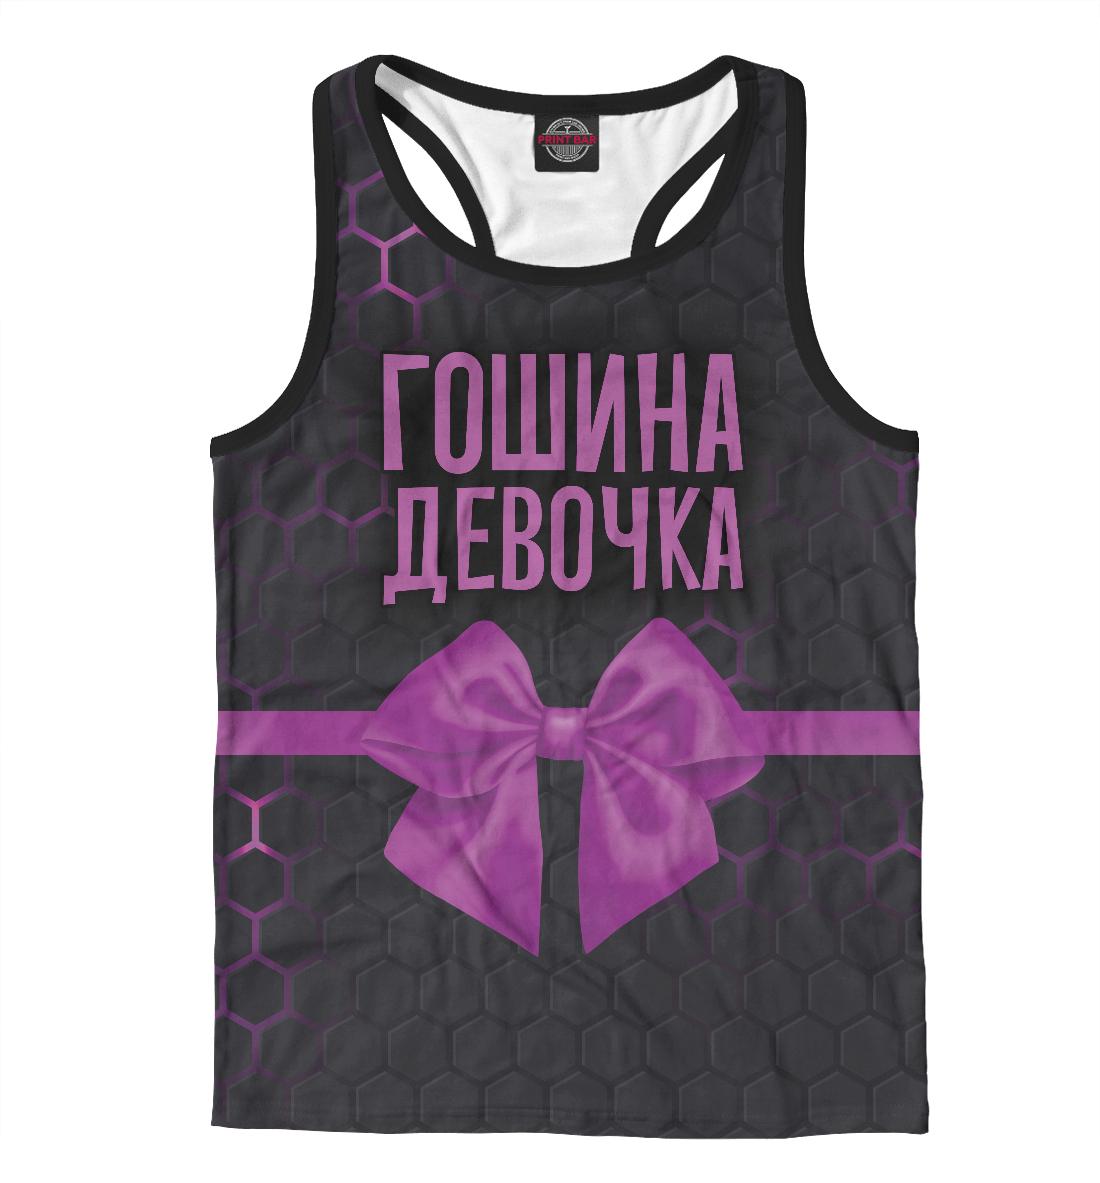 Майка борцовка Гошина девочка (422326)